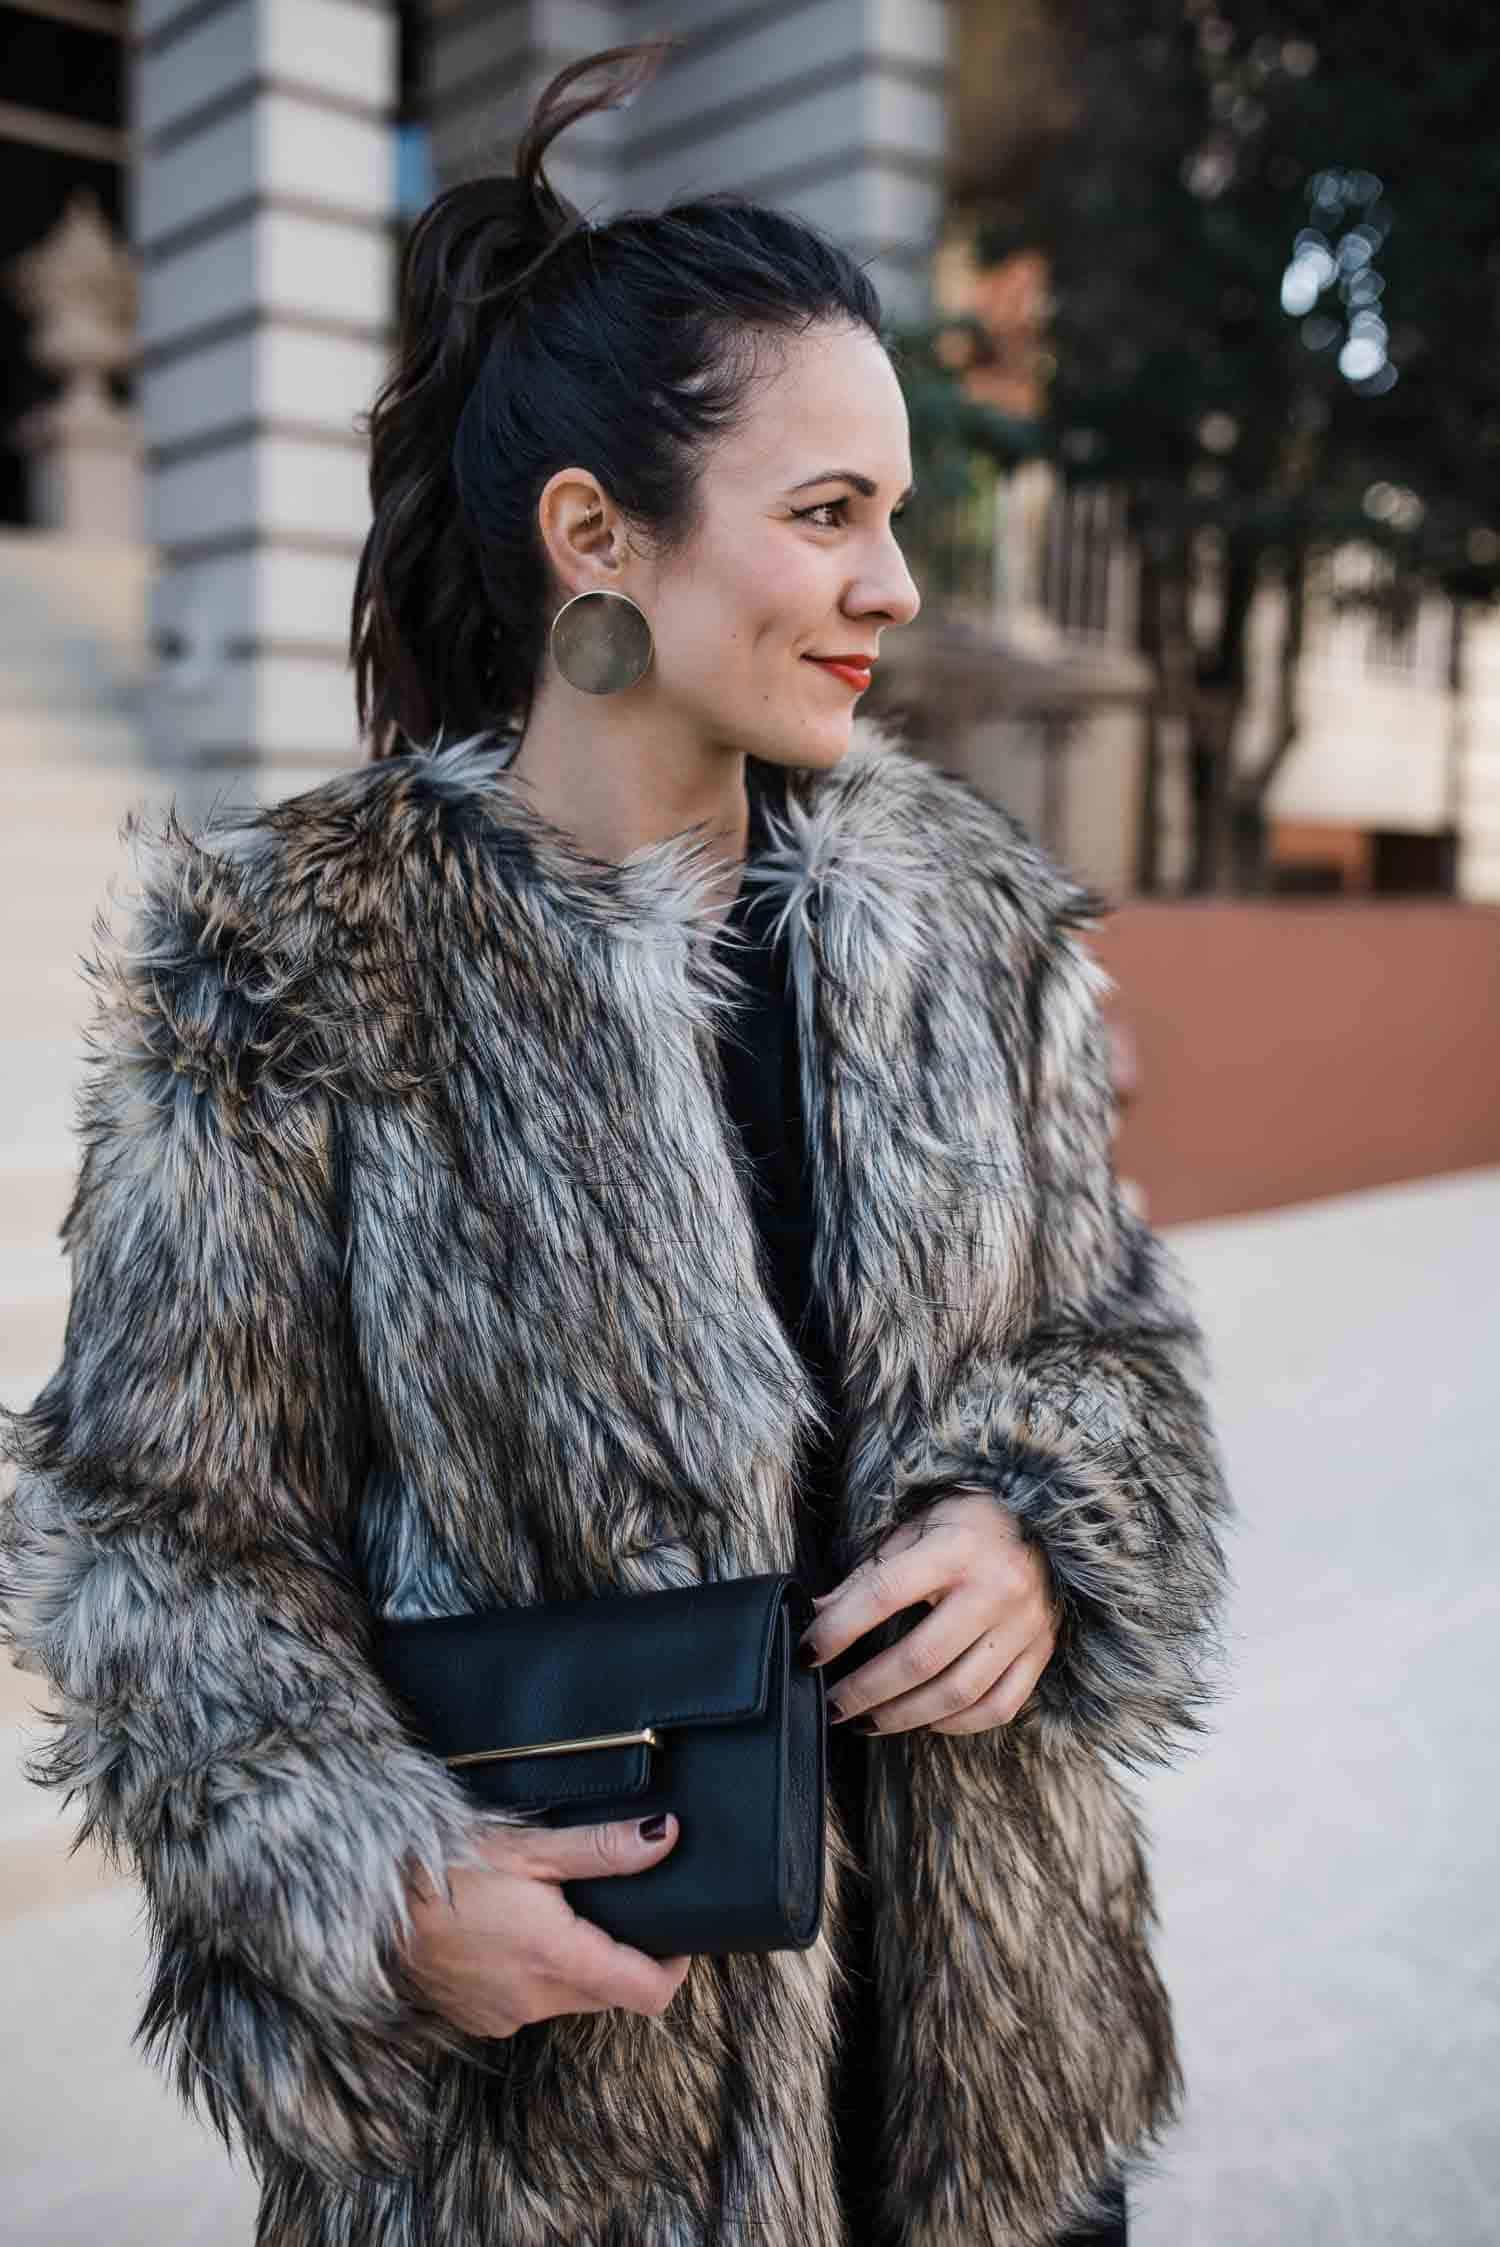 Vince Camuto faux fur jacket - Jessica Camerata